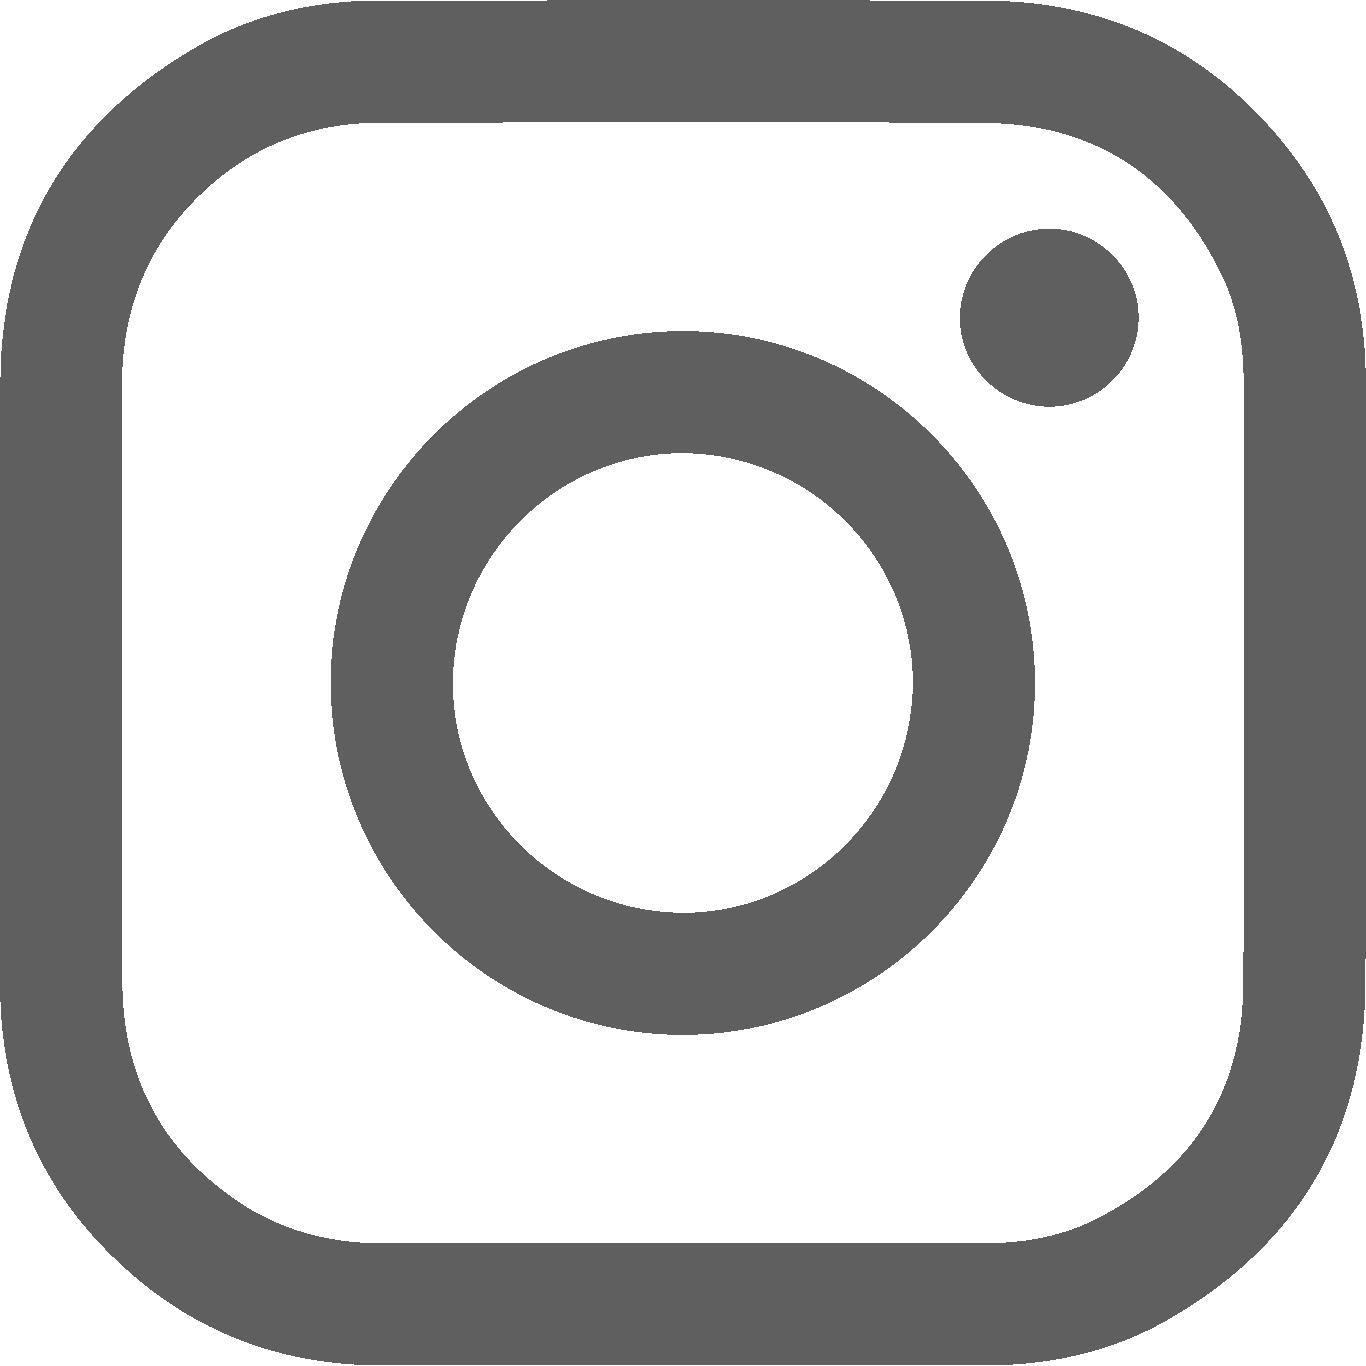 Icona logo Instagram